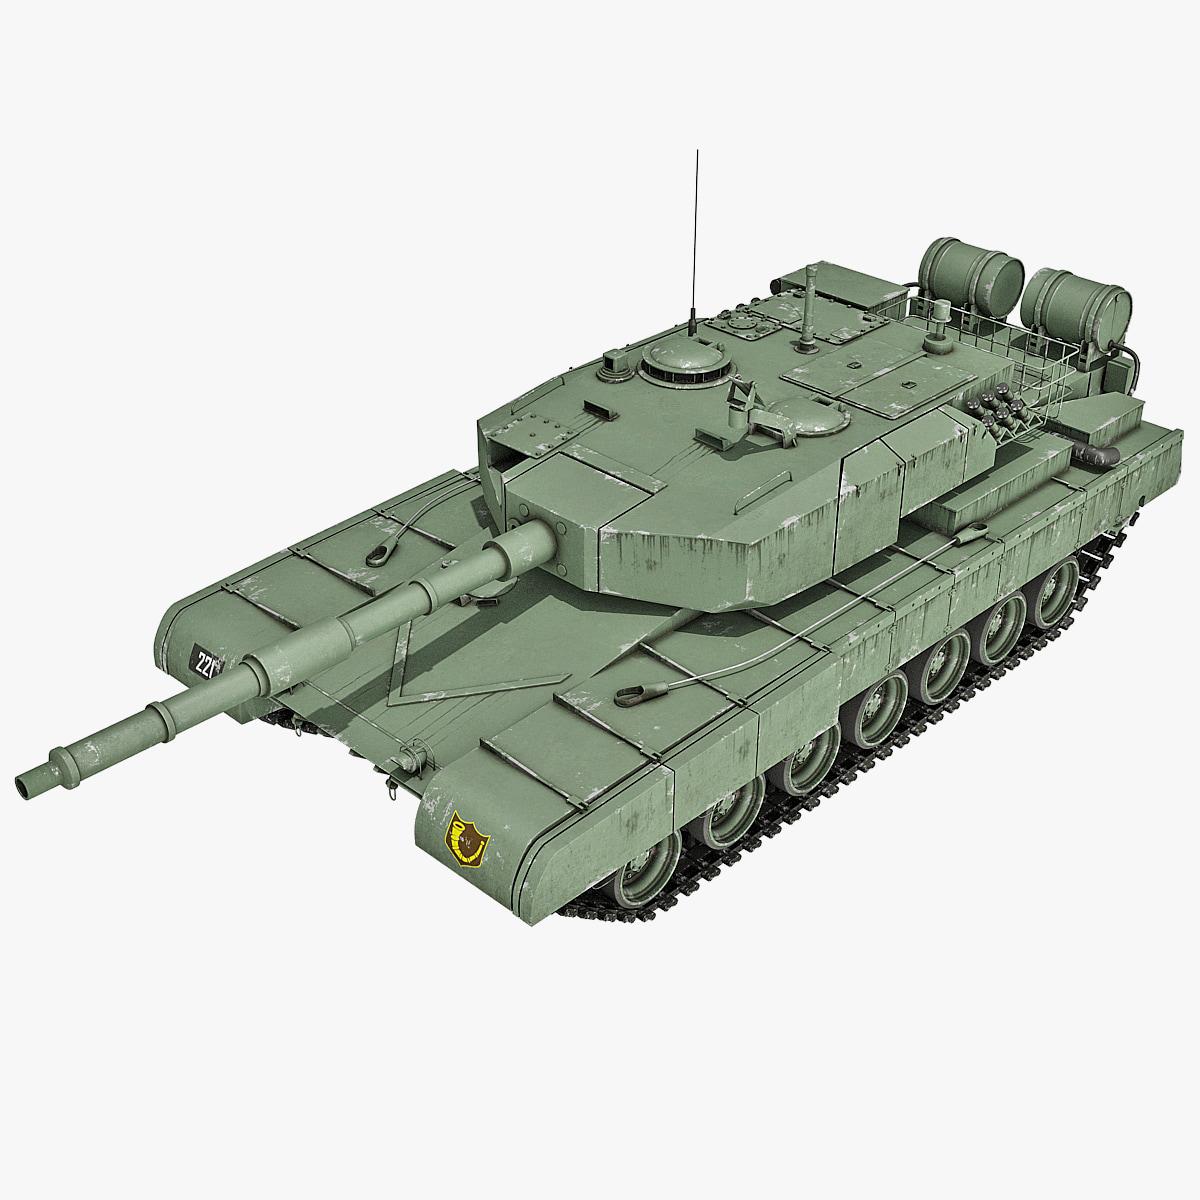 127347_Arjun_India_Main_Battle_Tank_2_000.jpg